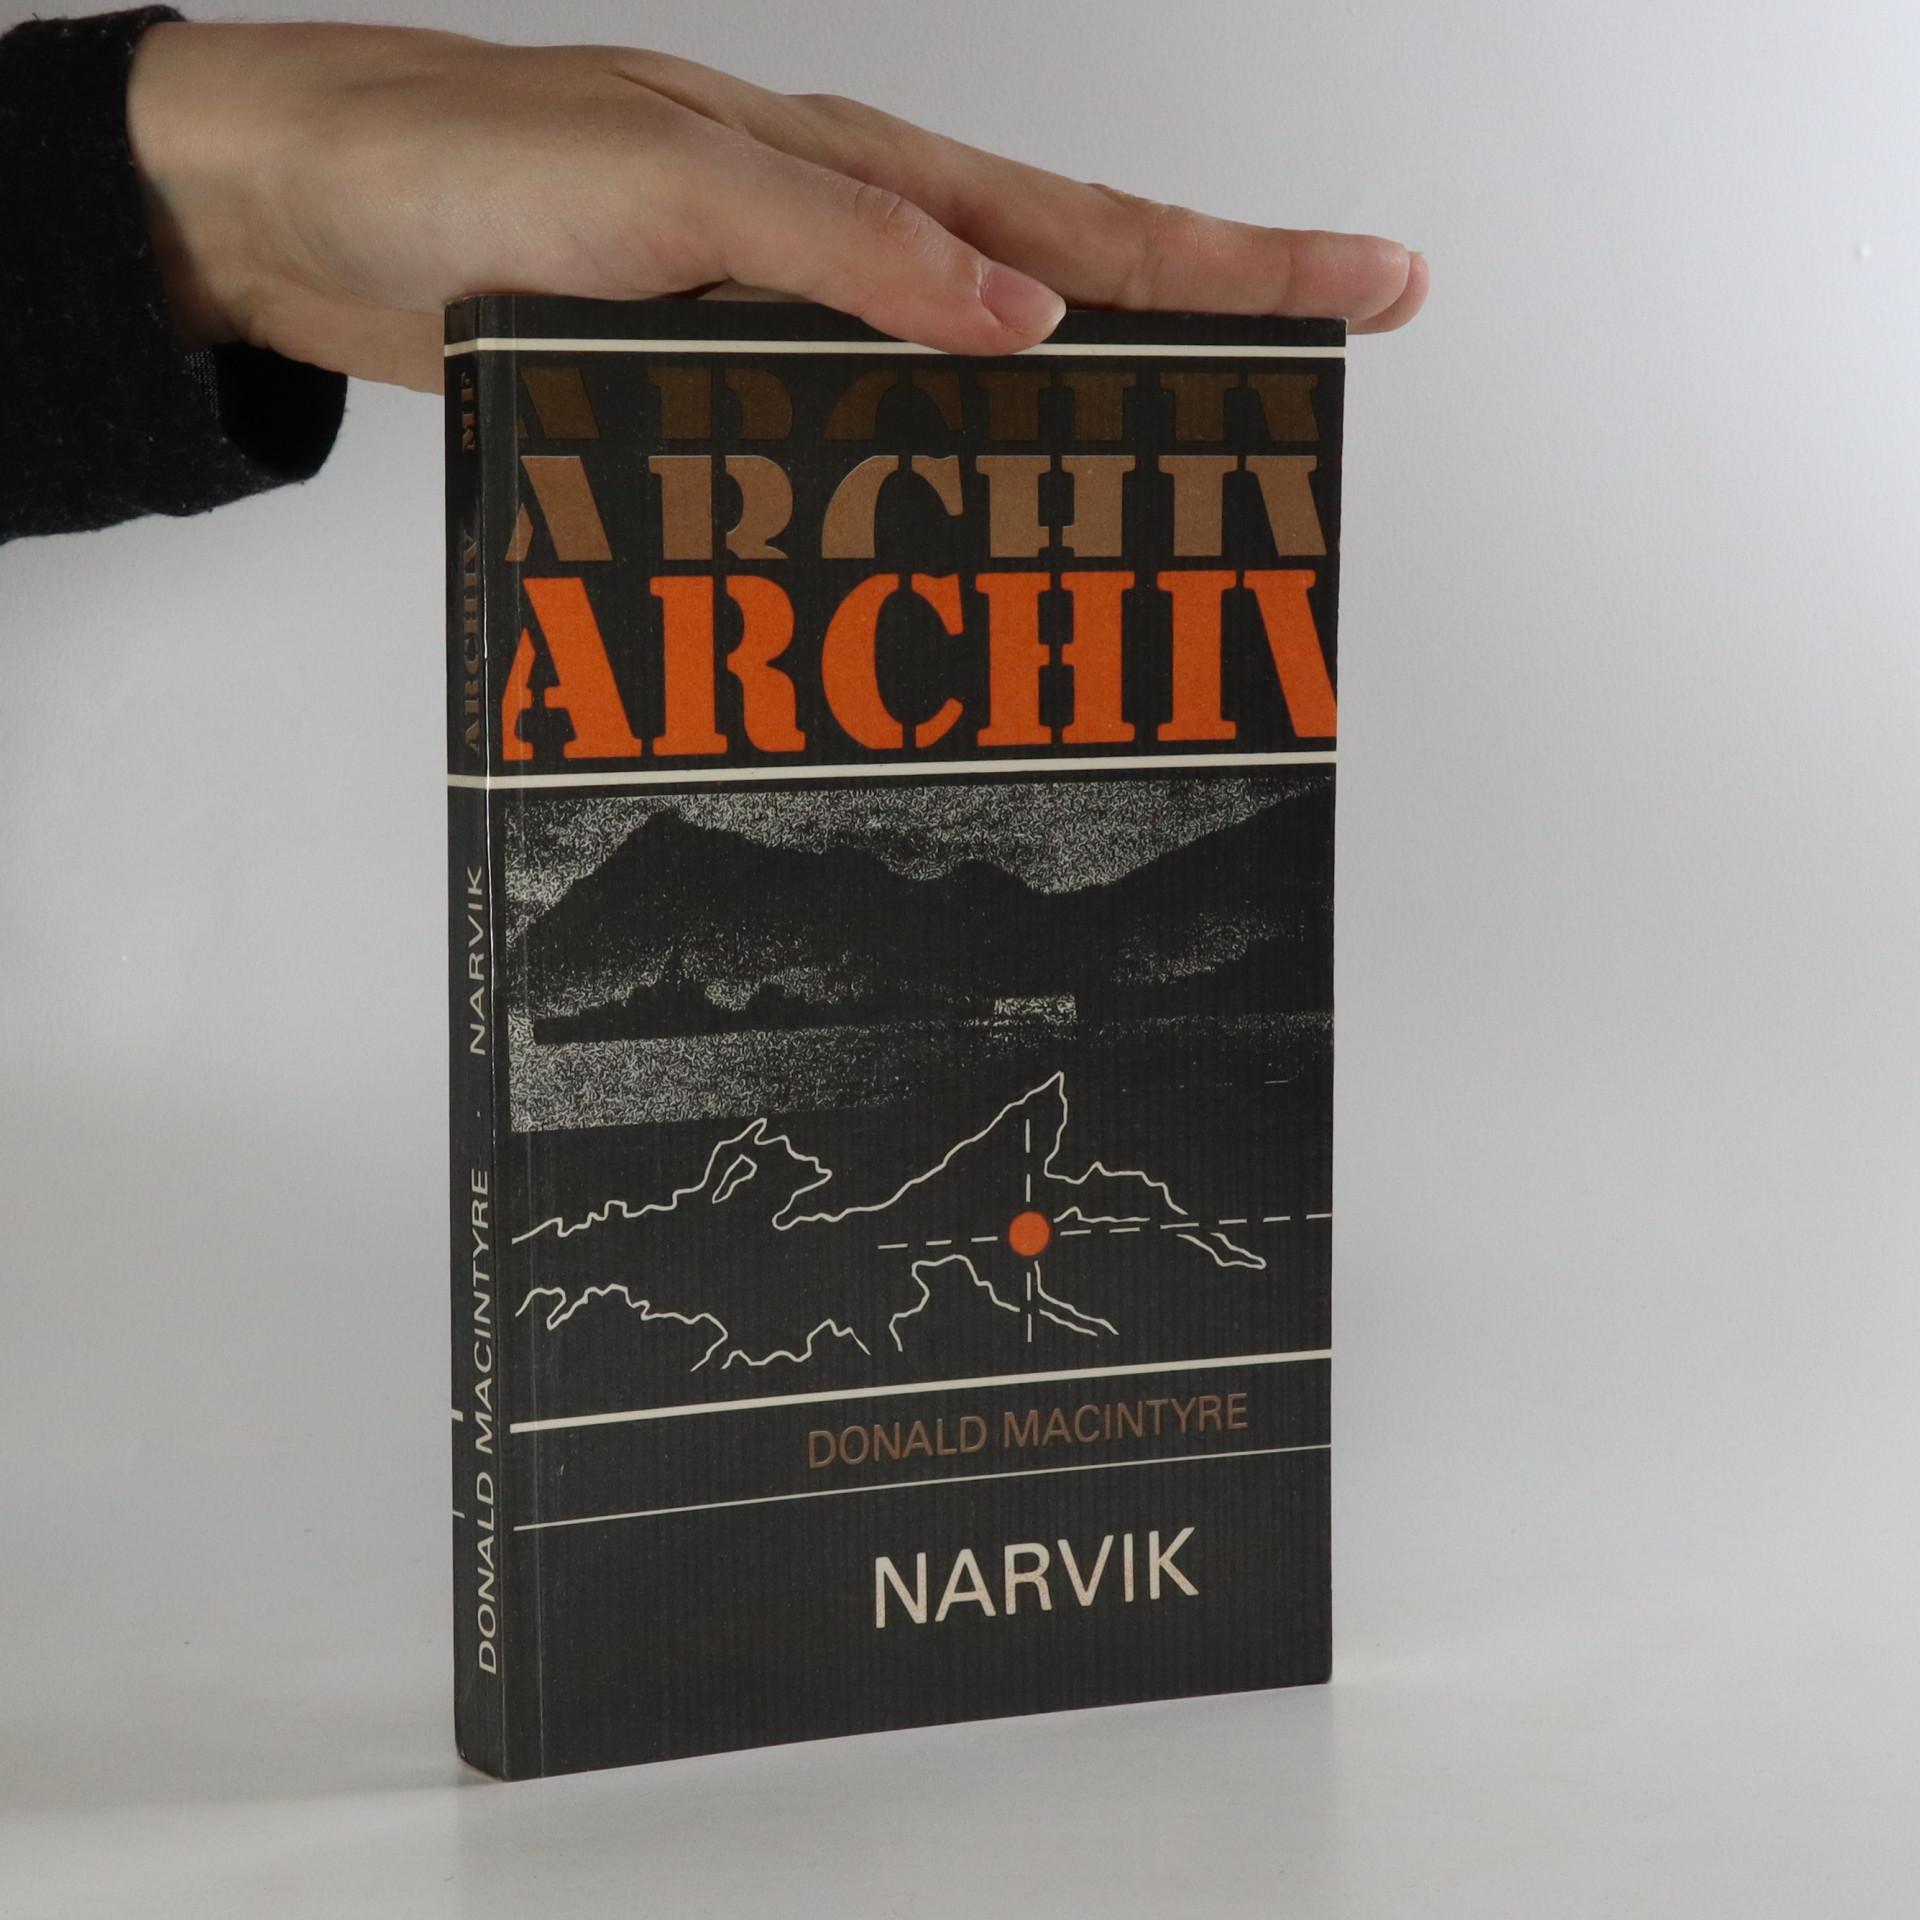 antikvární kniha Narvik, 1989